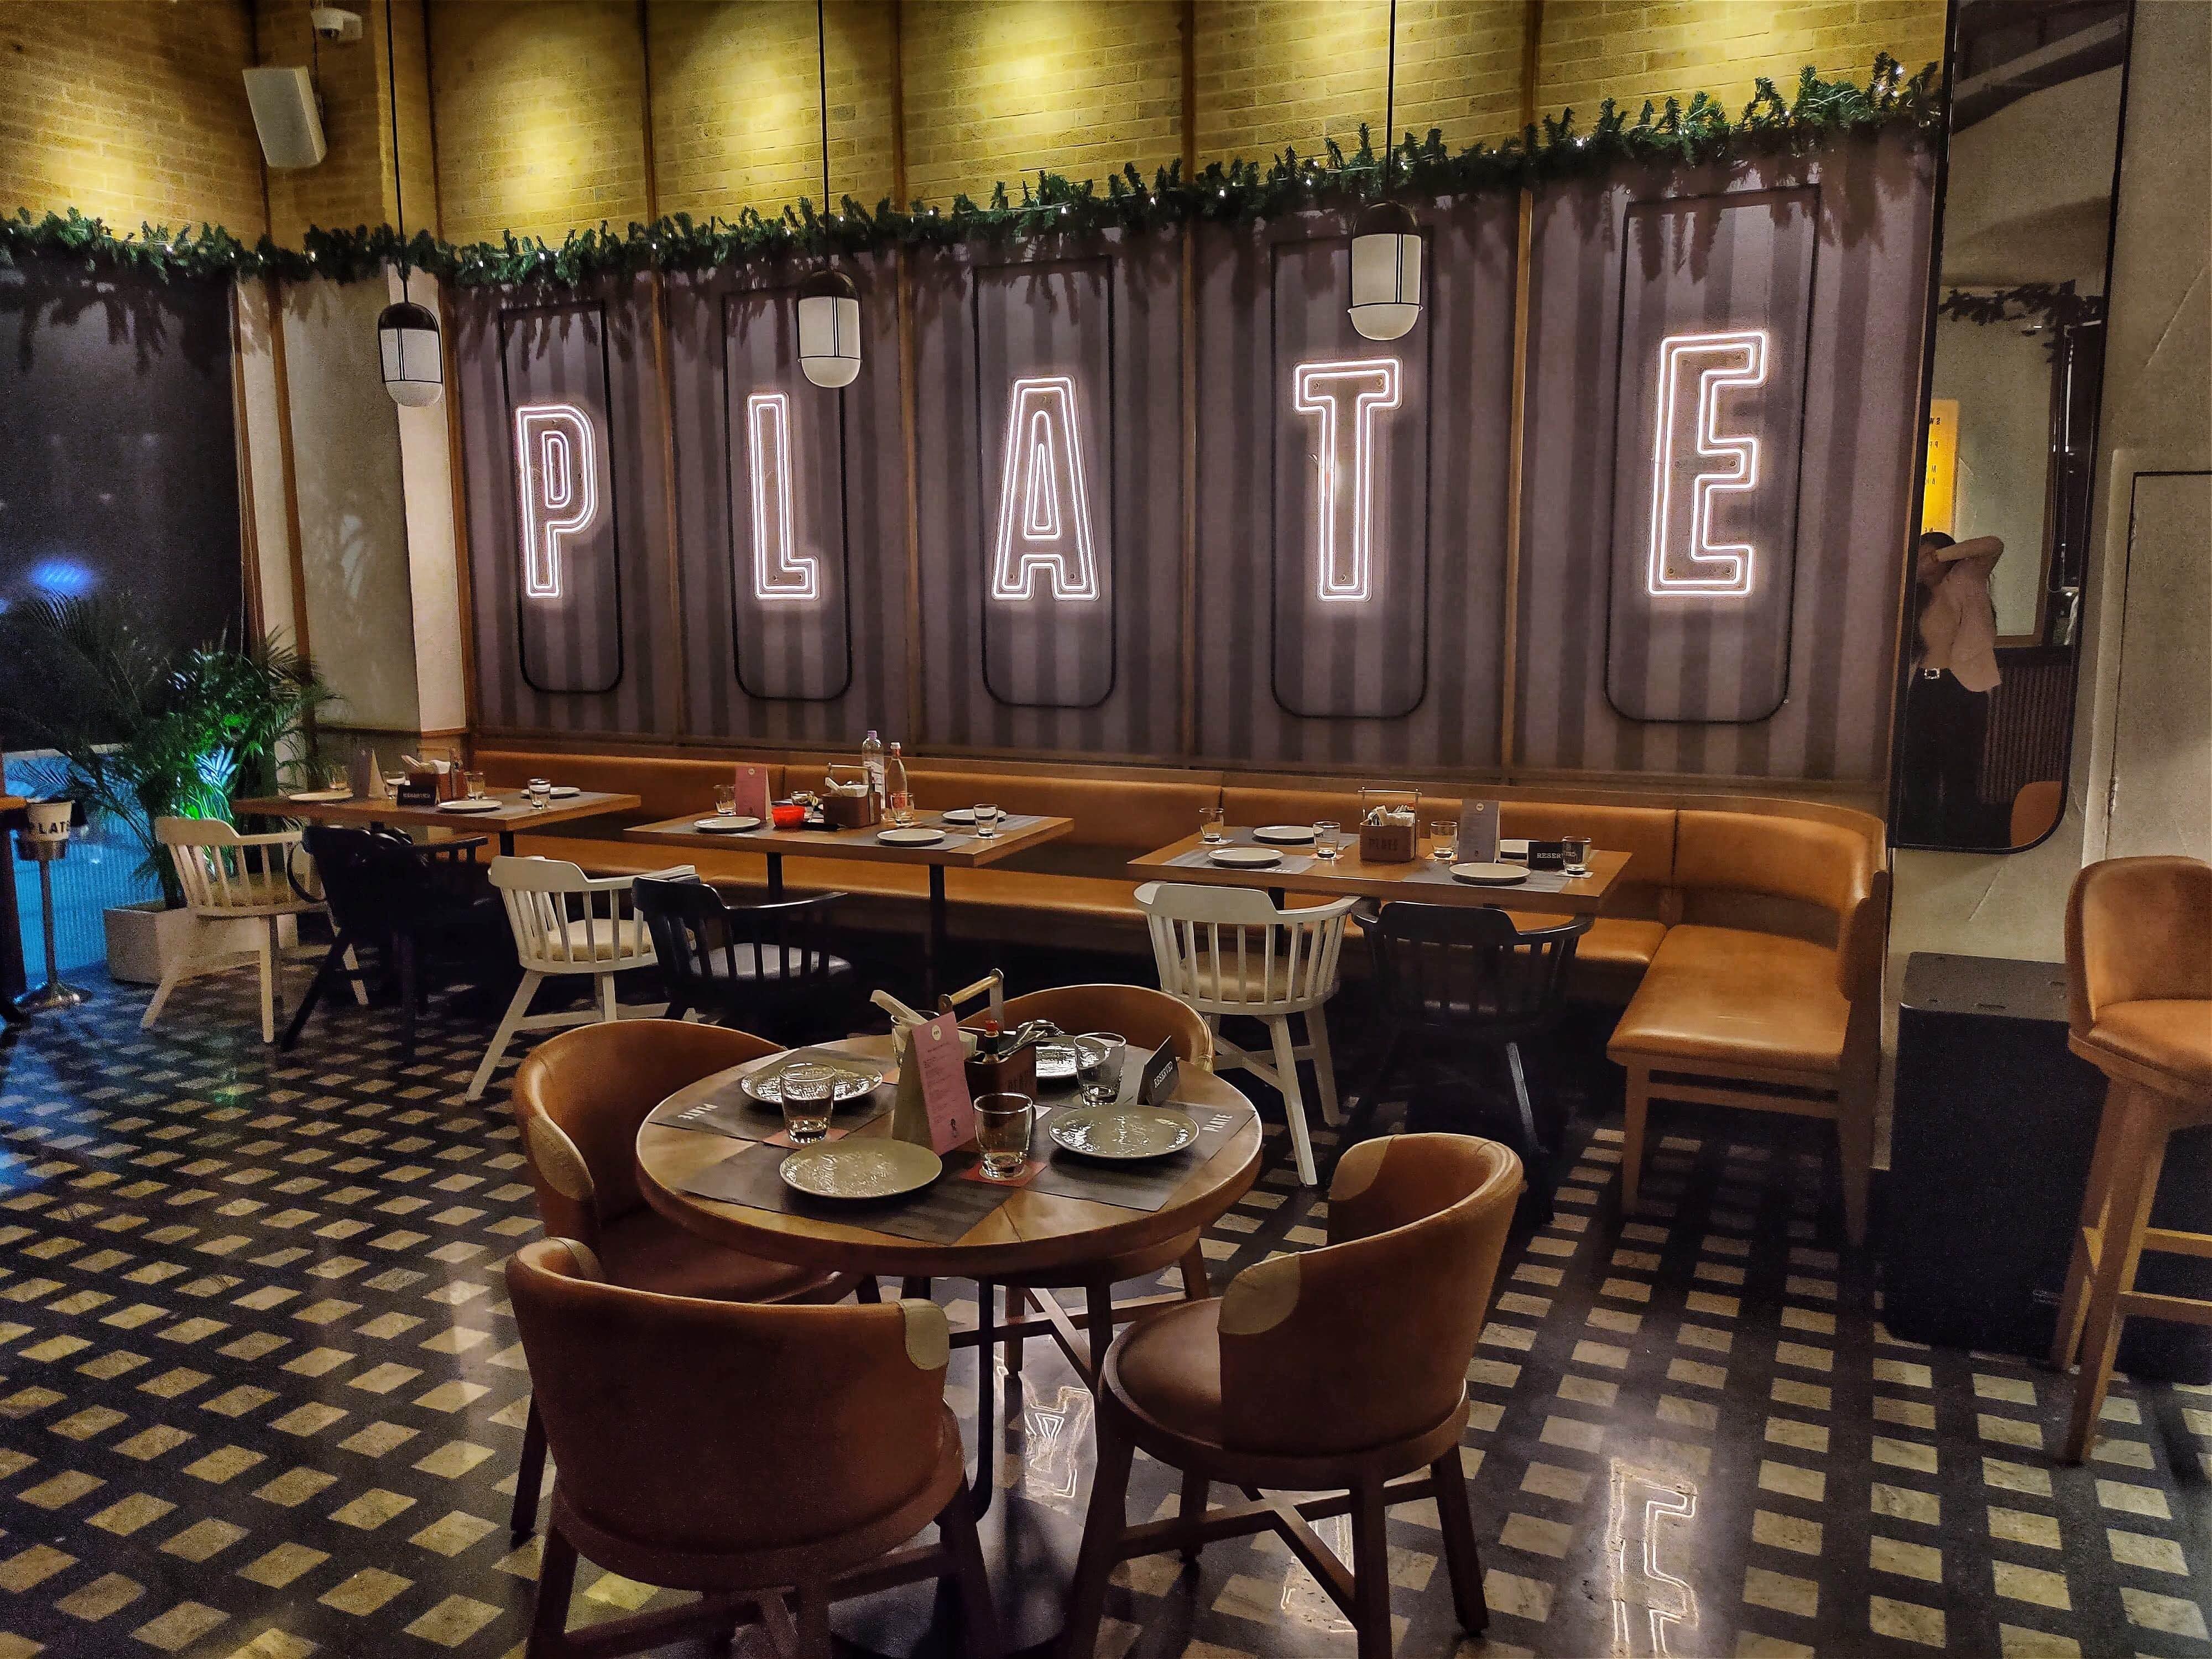 Restaurant,Room,Interior design,Building,Table,Café,Architecture,Furniture,Dining room,House